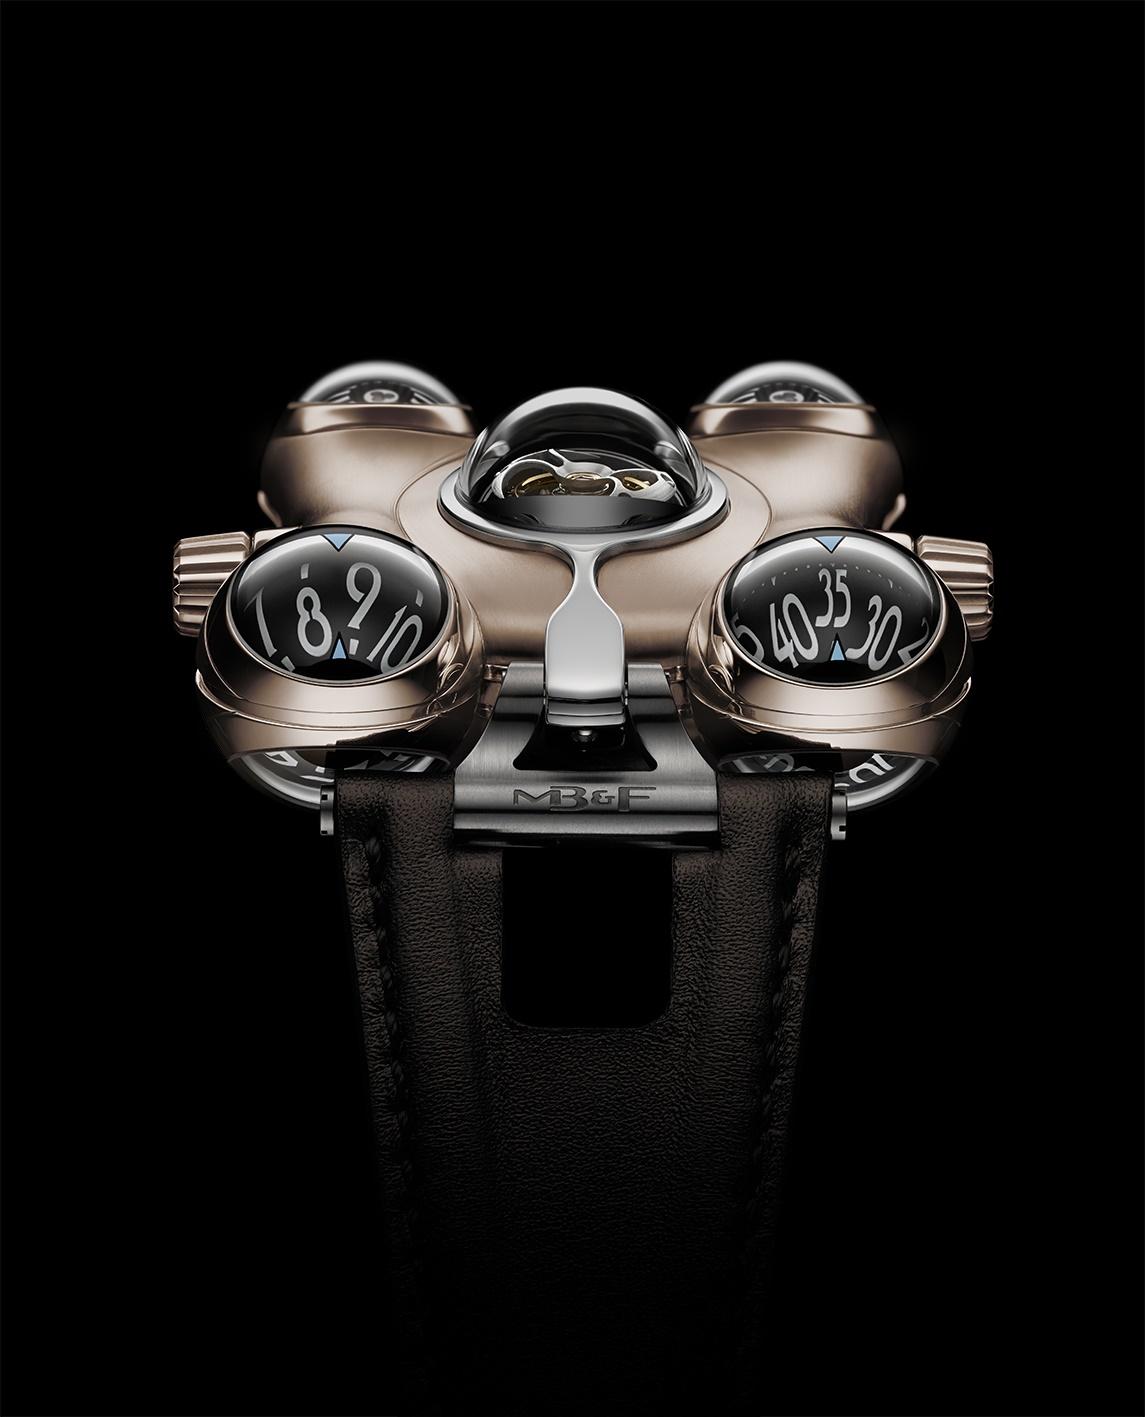 2015 Swiss replica Rolex watches